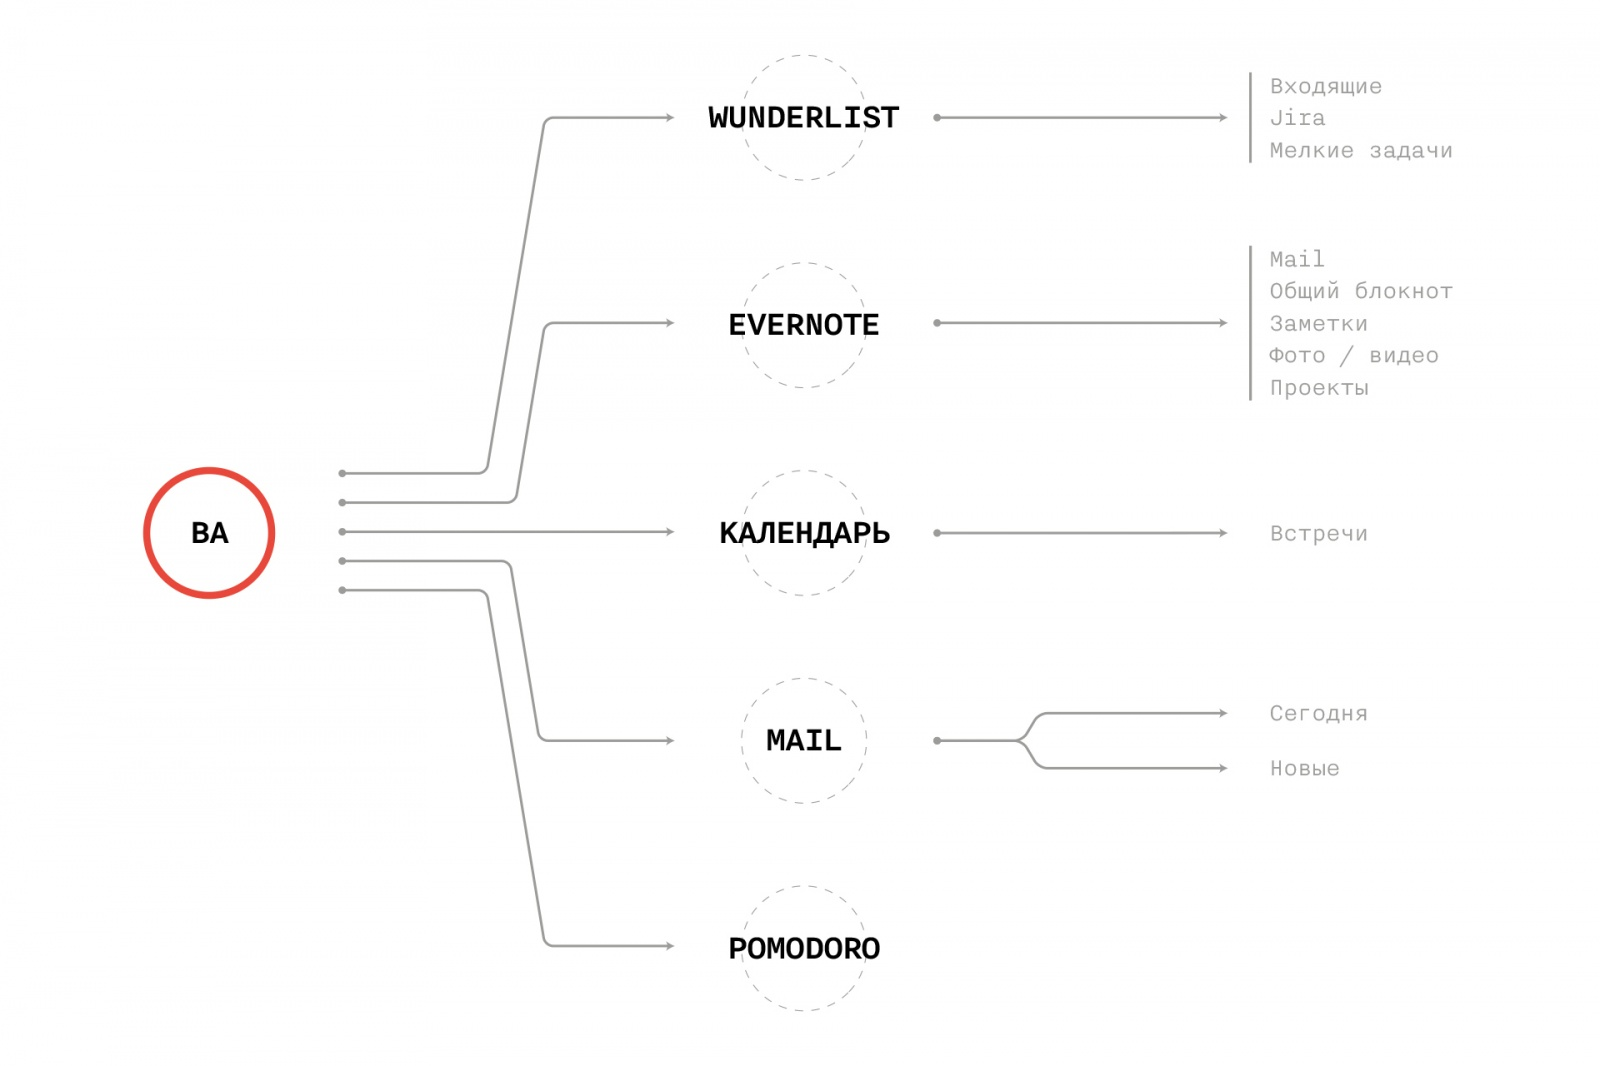 Инструментарий бизнес-аналитика: личный опыт - 1